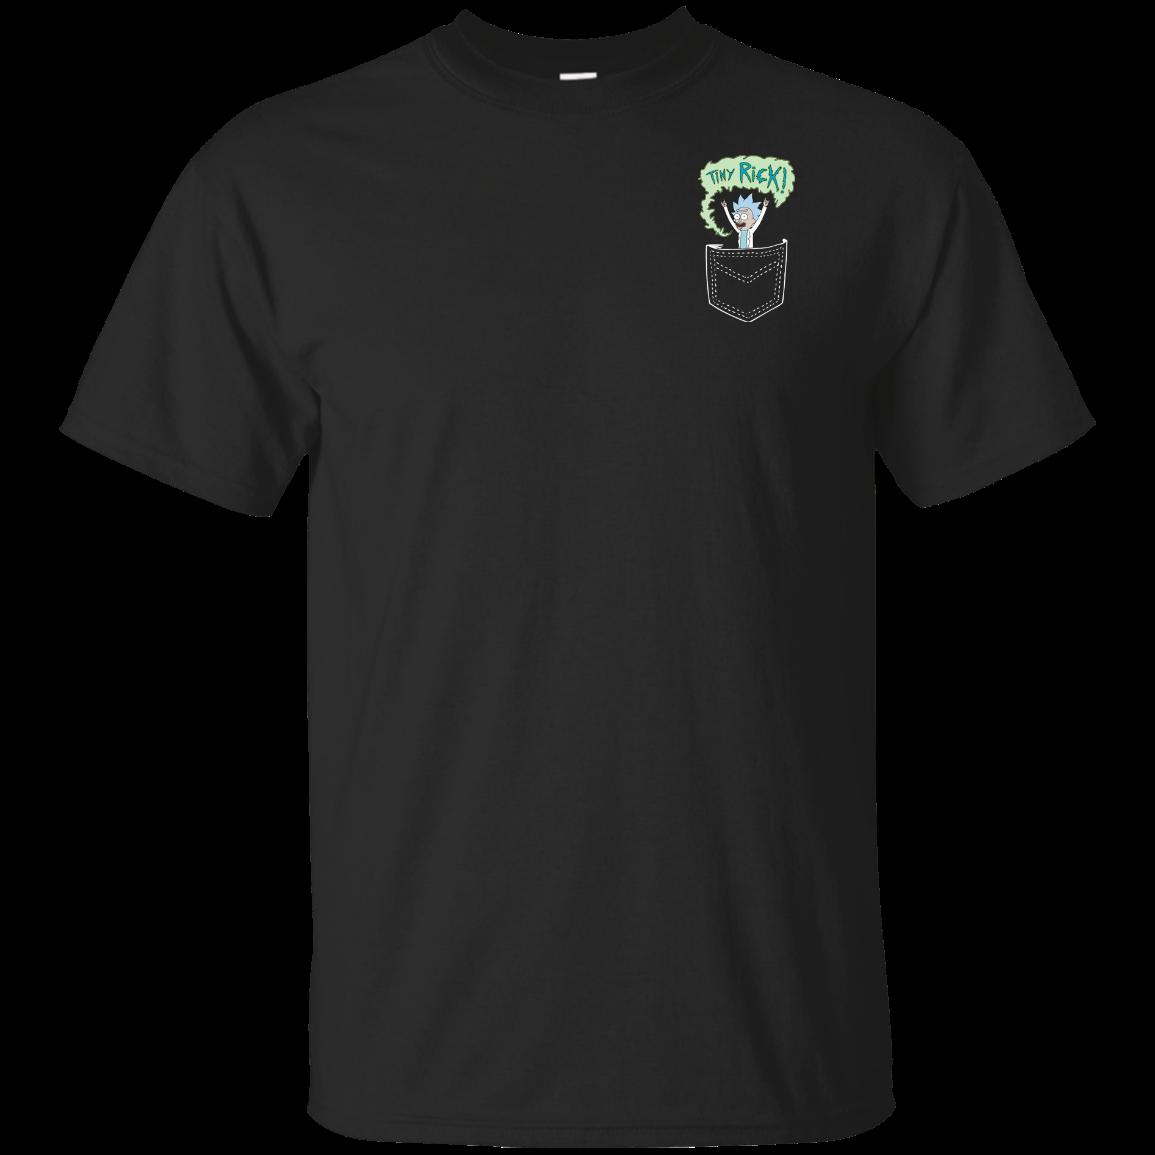 image 897px Rick and Morty: Tiny Rick Pocket T Shirt